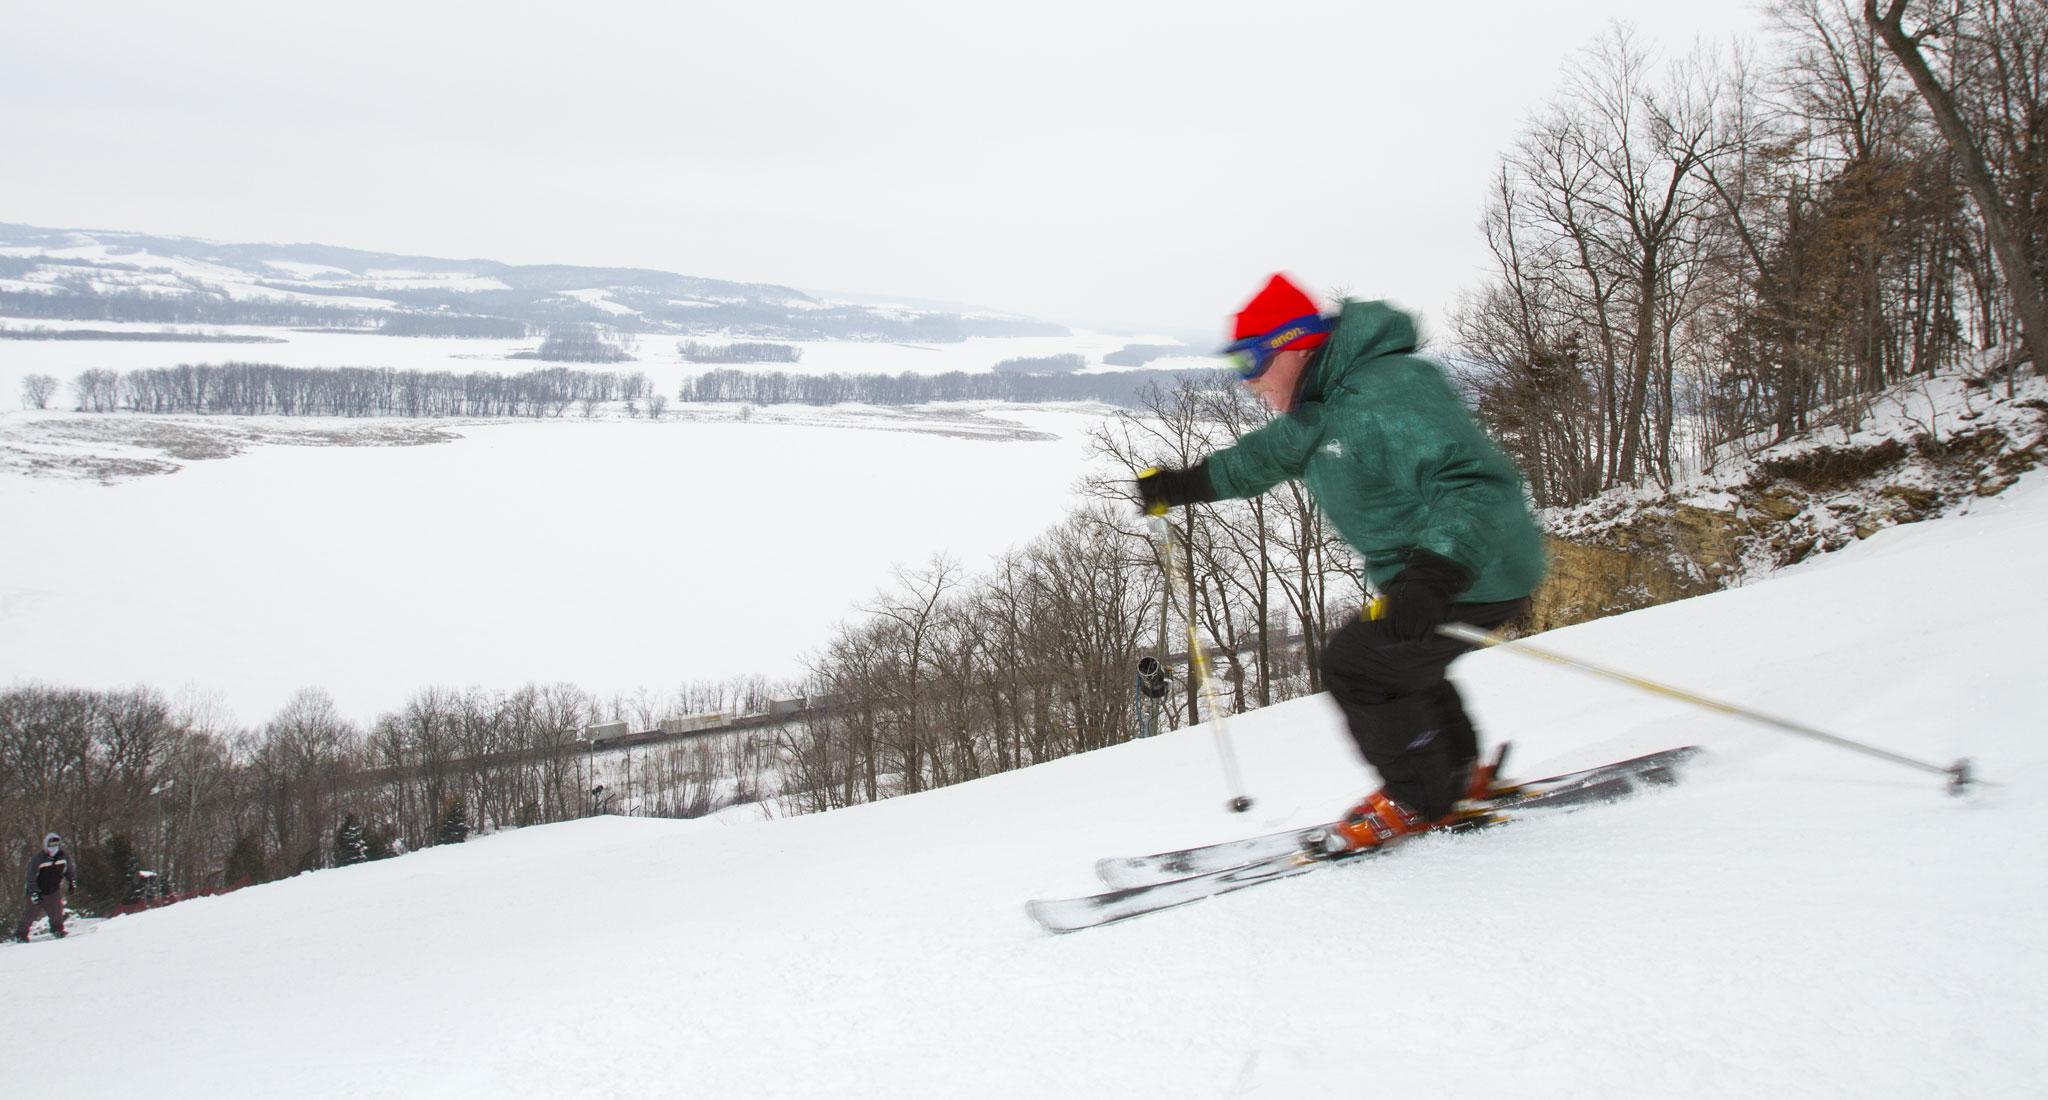 downhill skiing in illinois